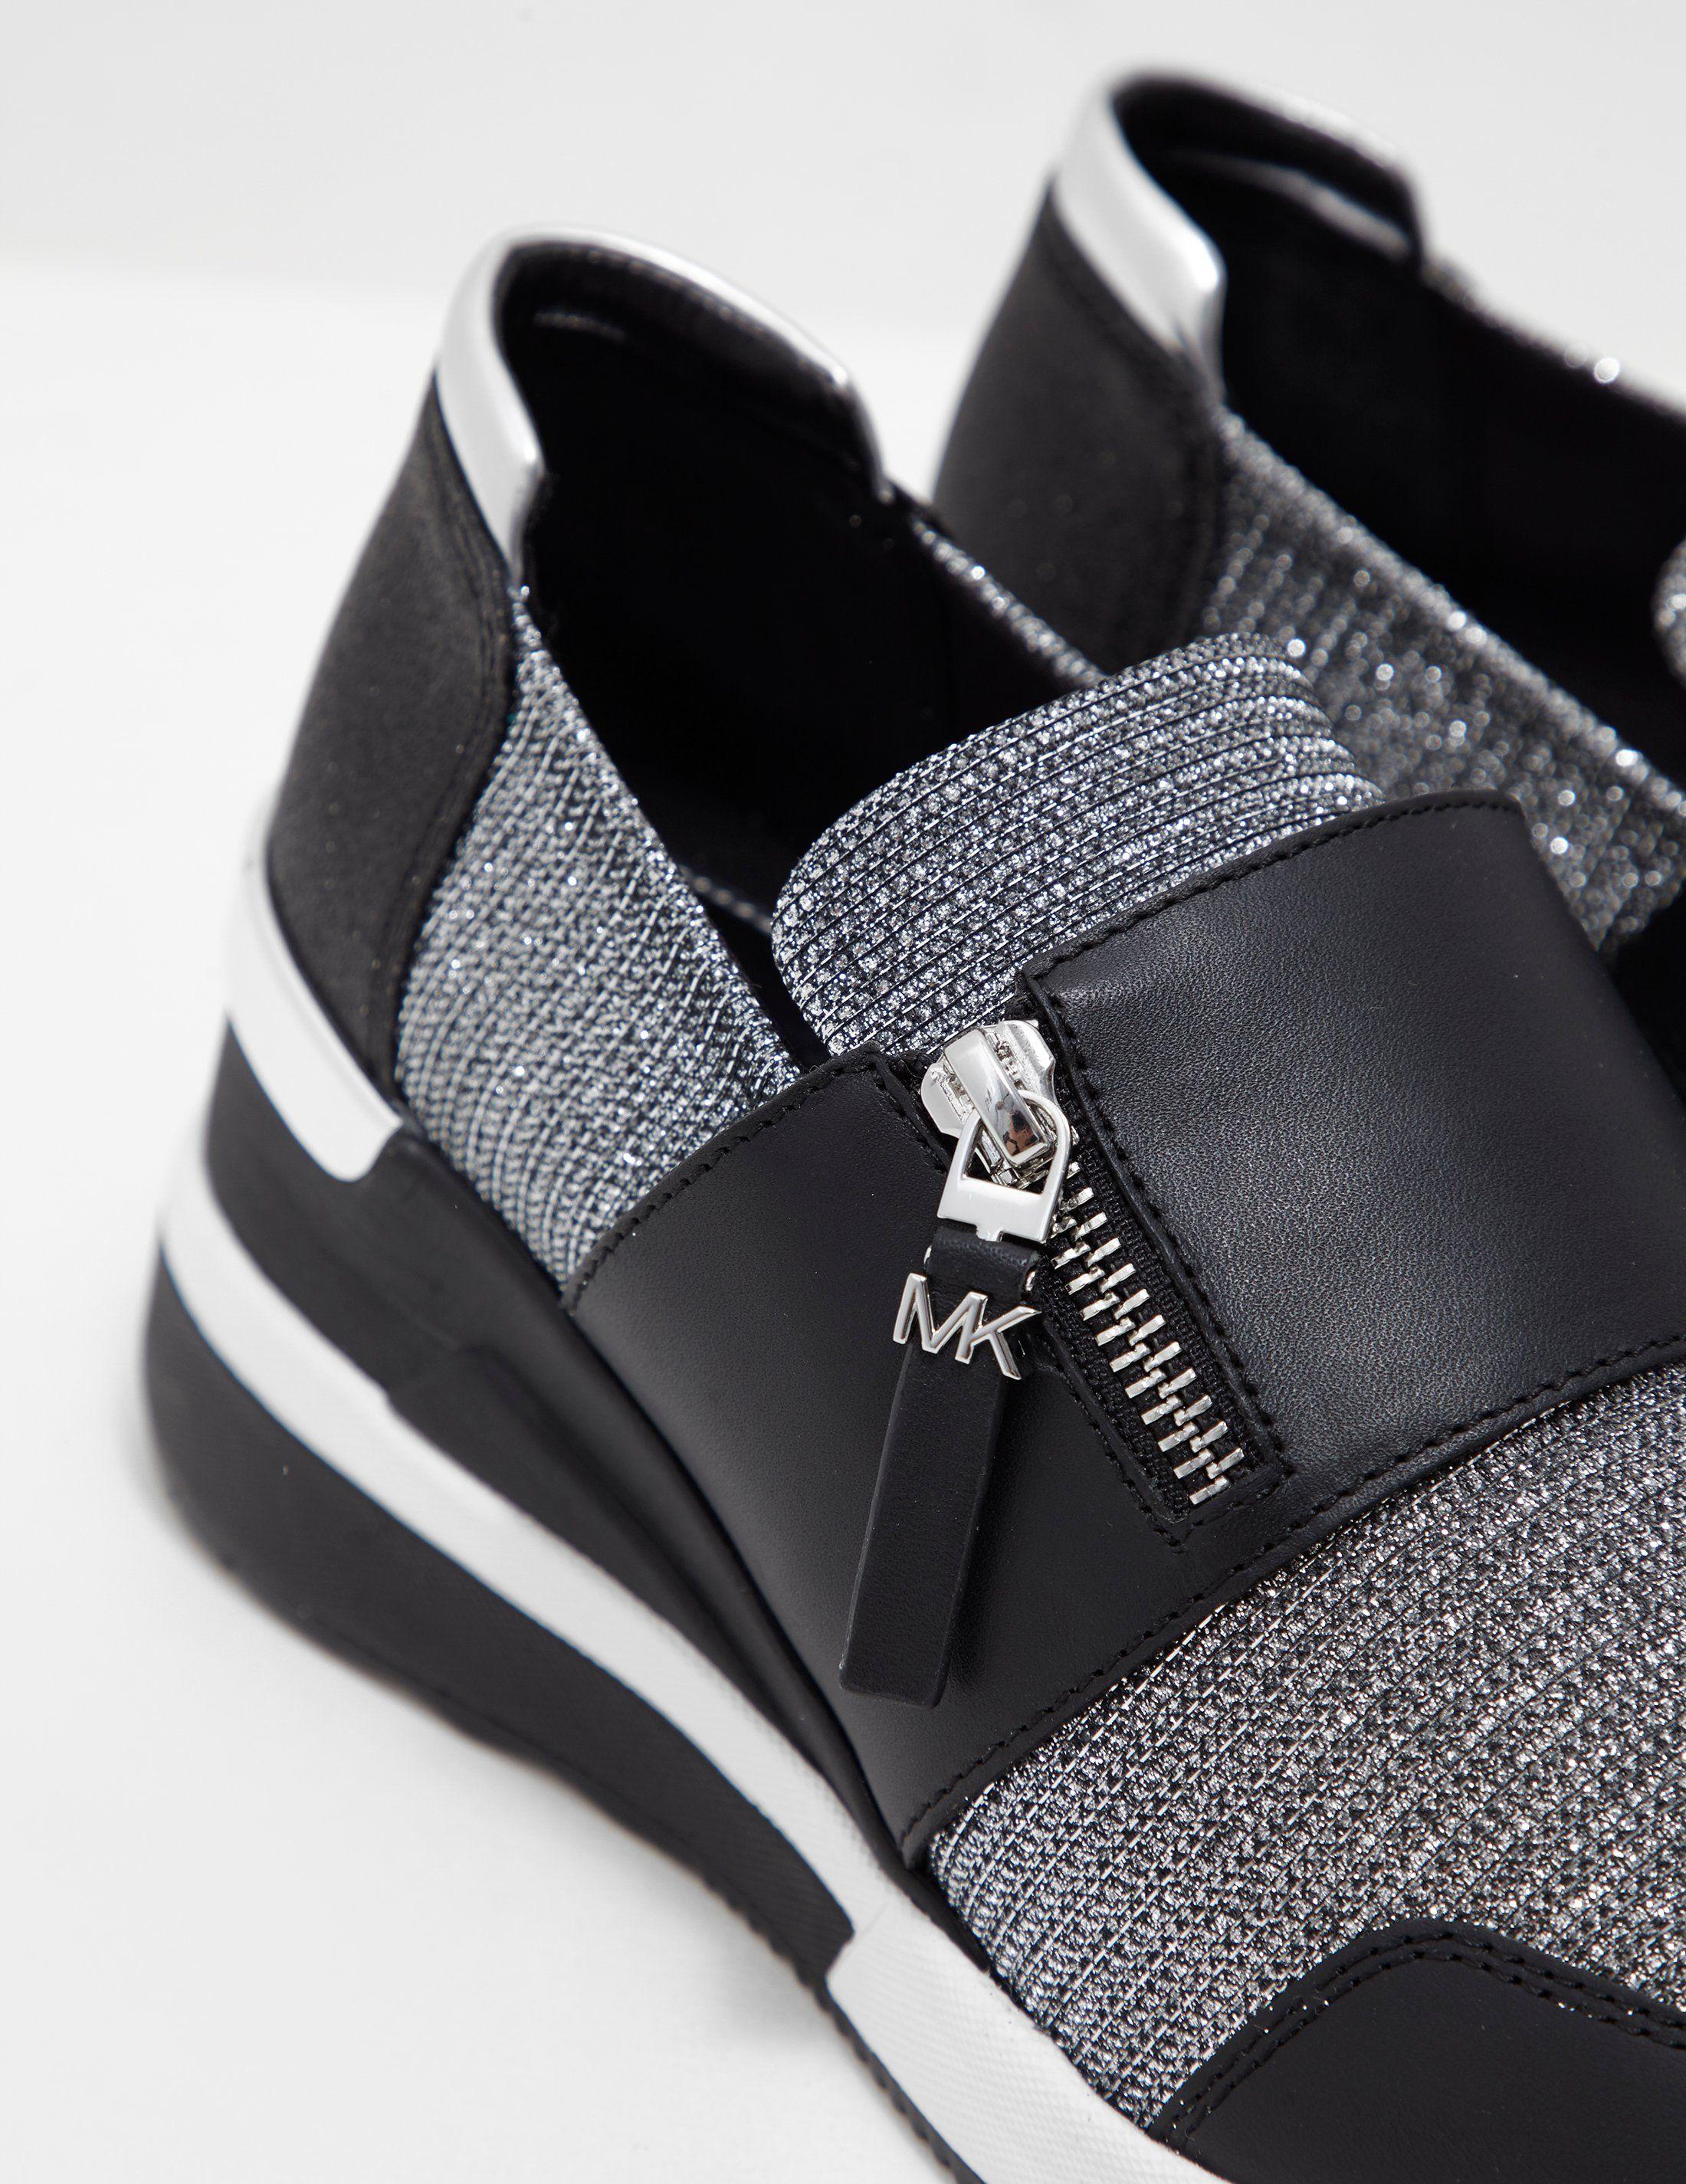 Michael Kors Chelsie Glitter Trainers - Online Exclusive